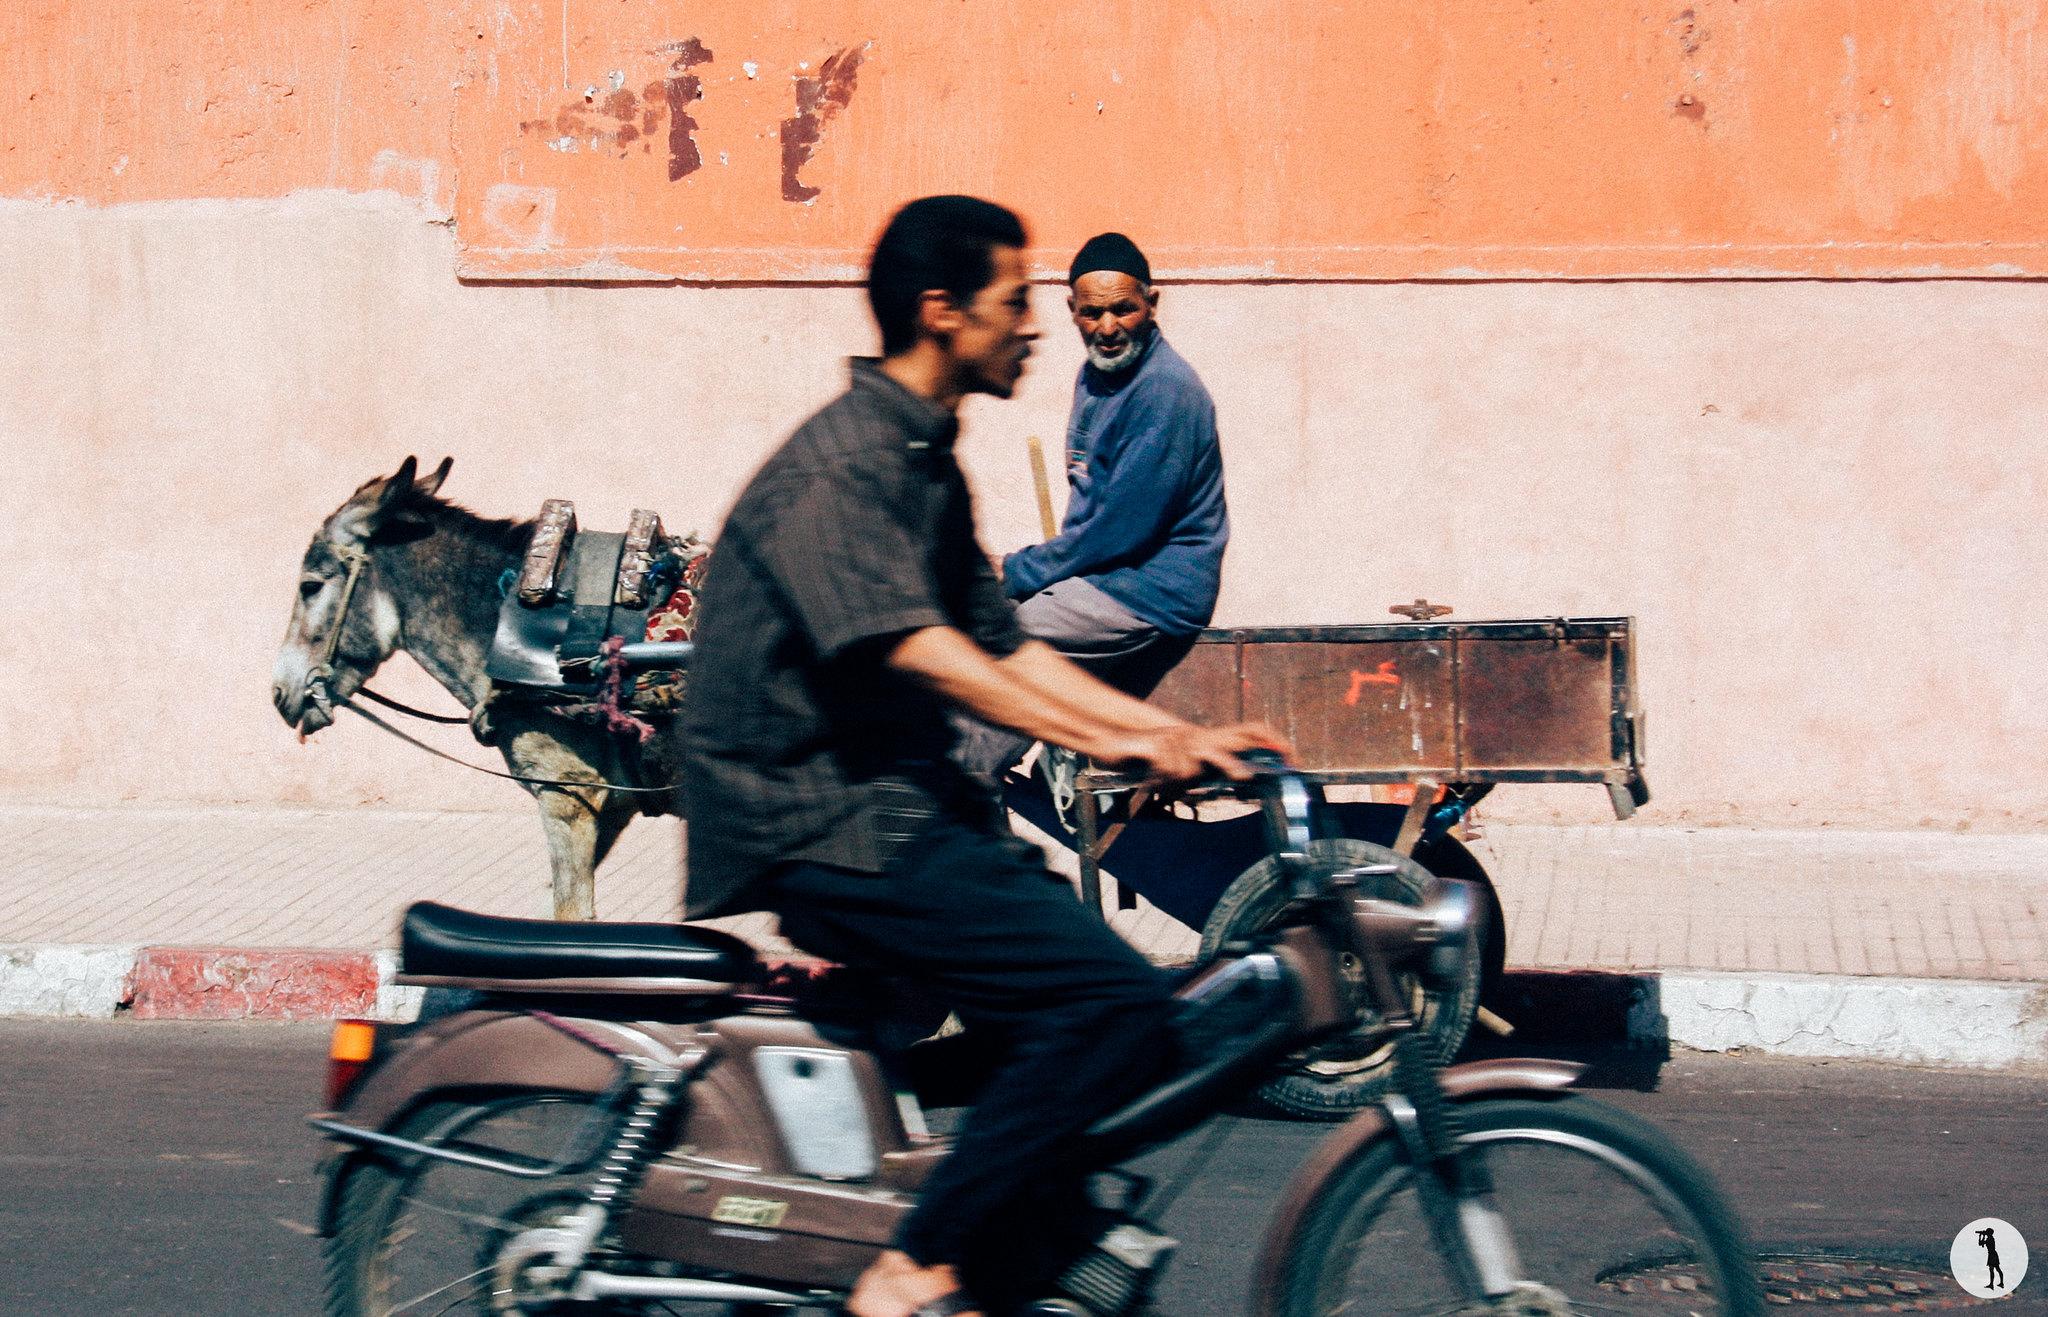 Voyage, Marrakech, Maroc (2012)